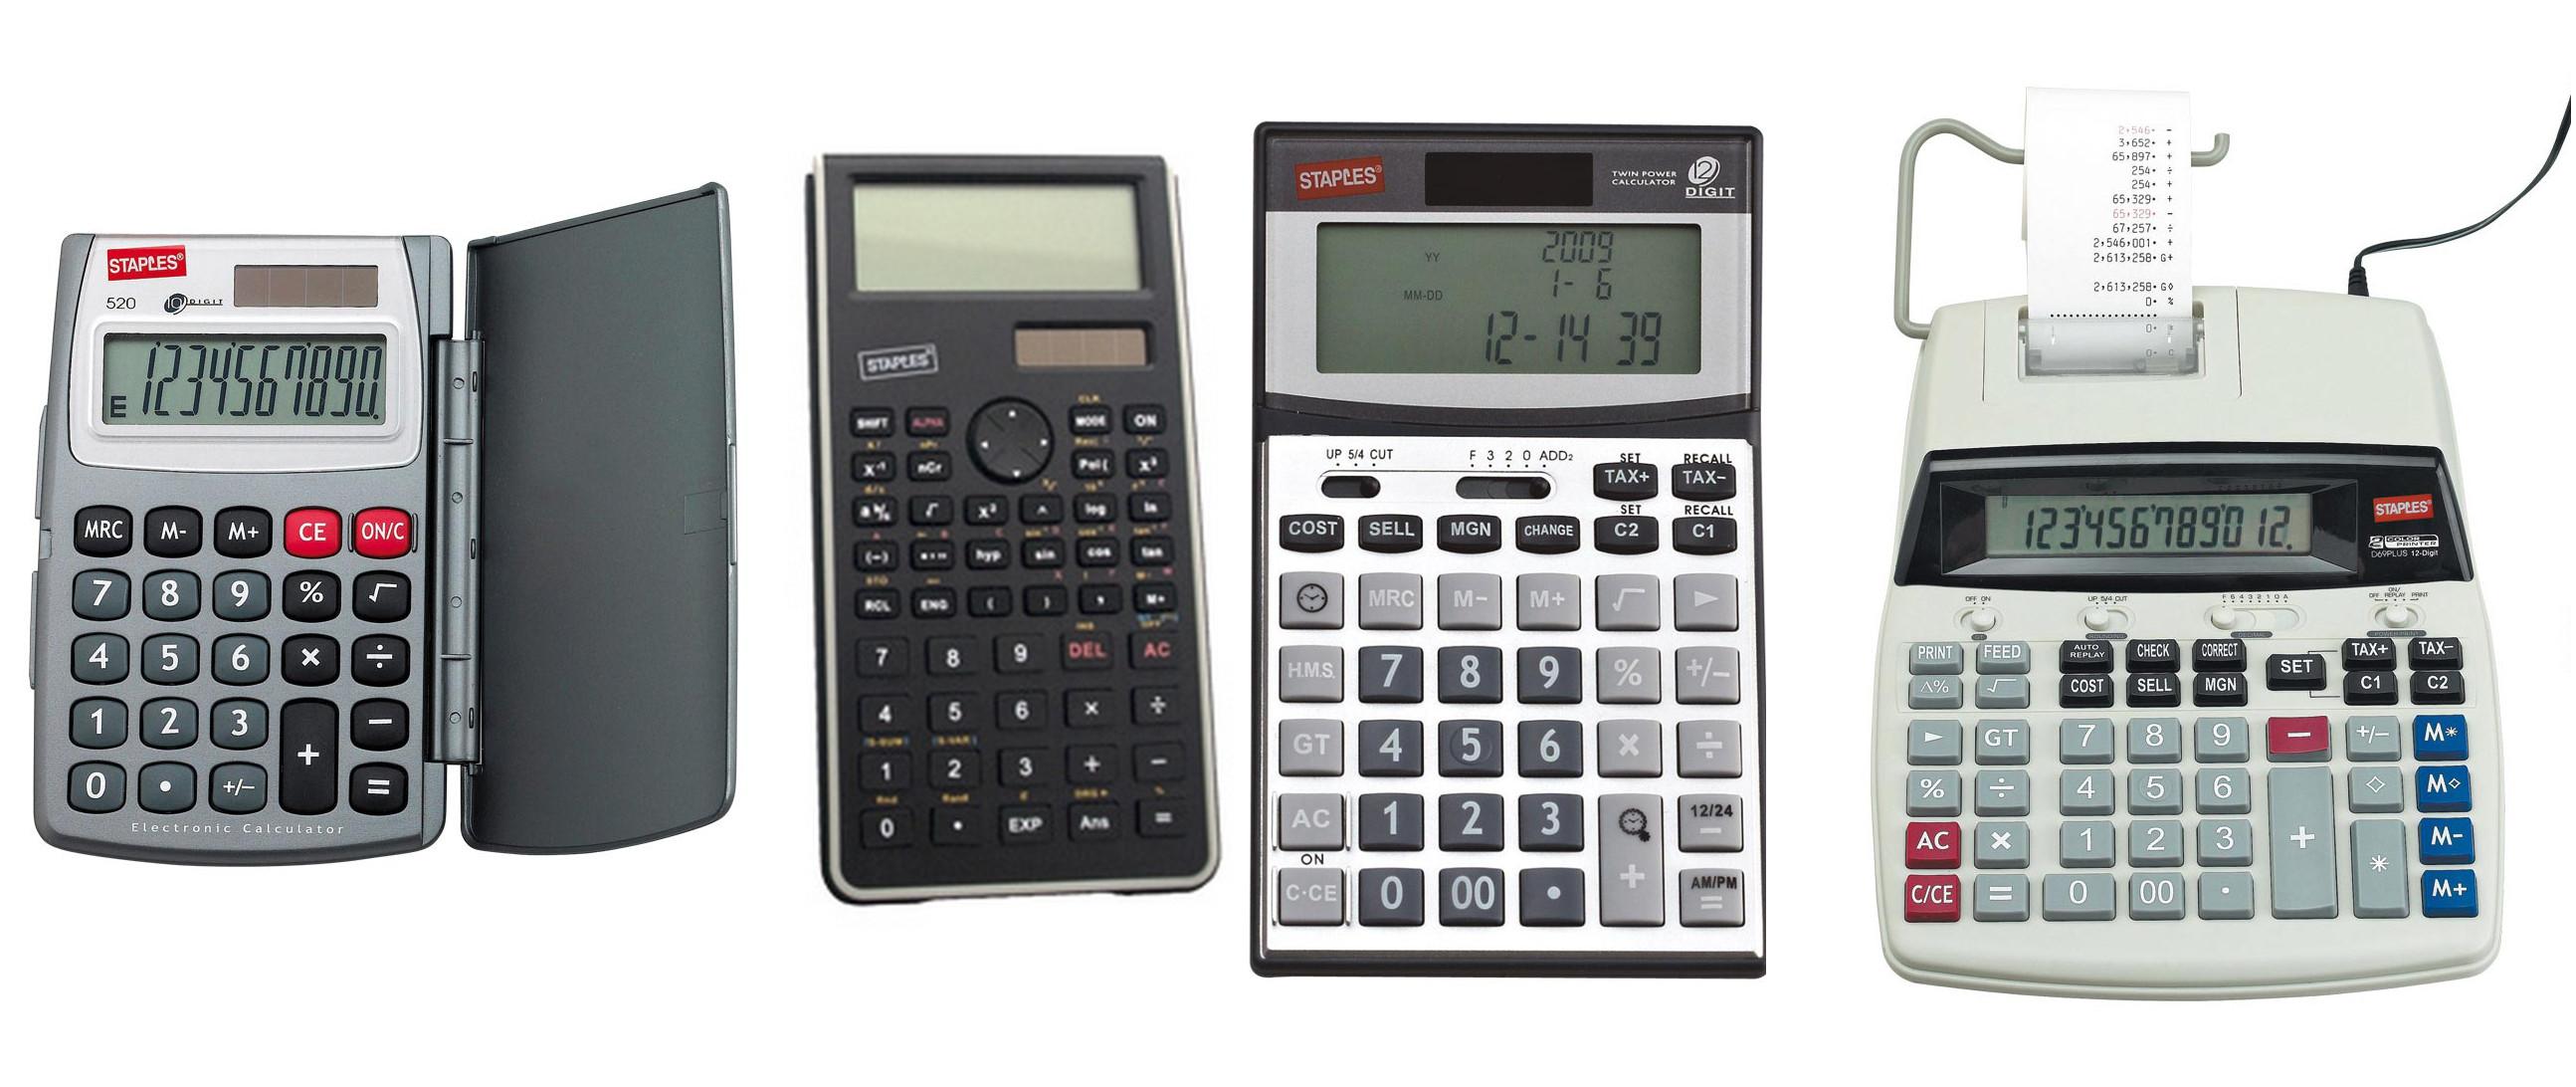 Original Calculator Functions For Algebra